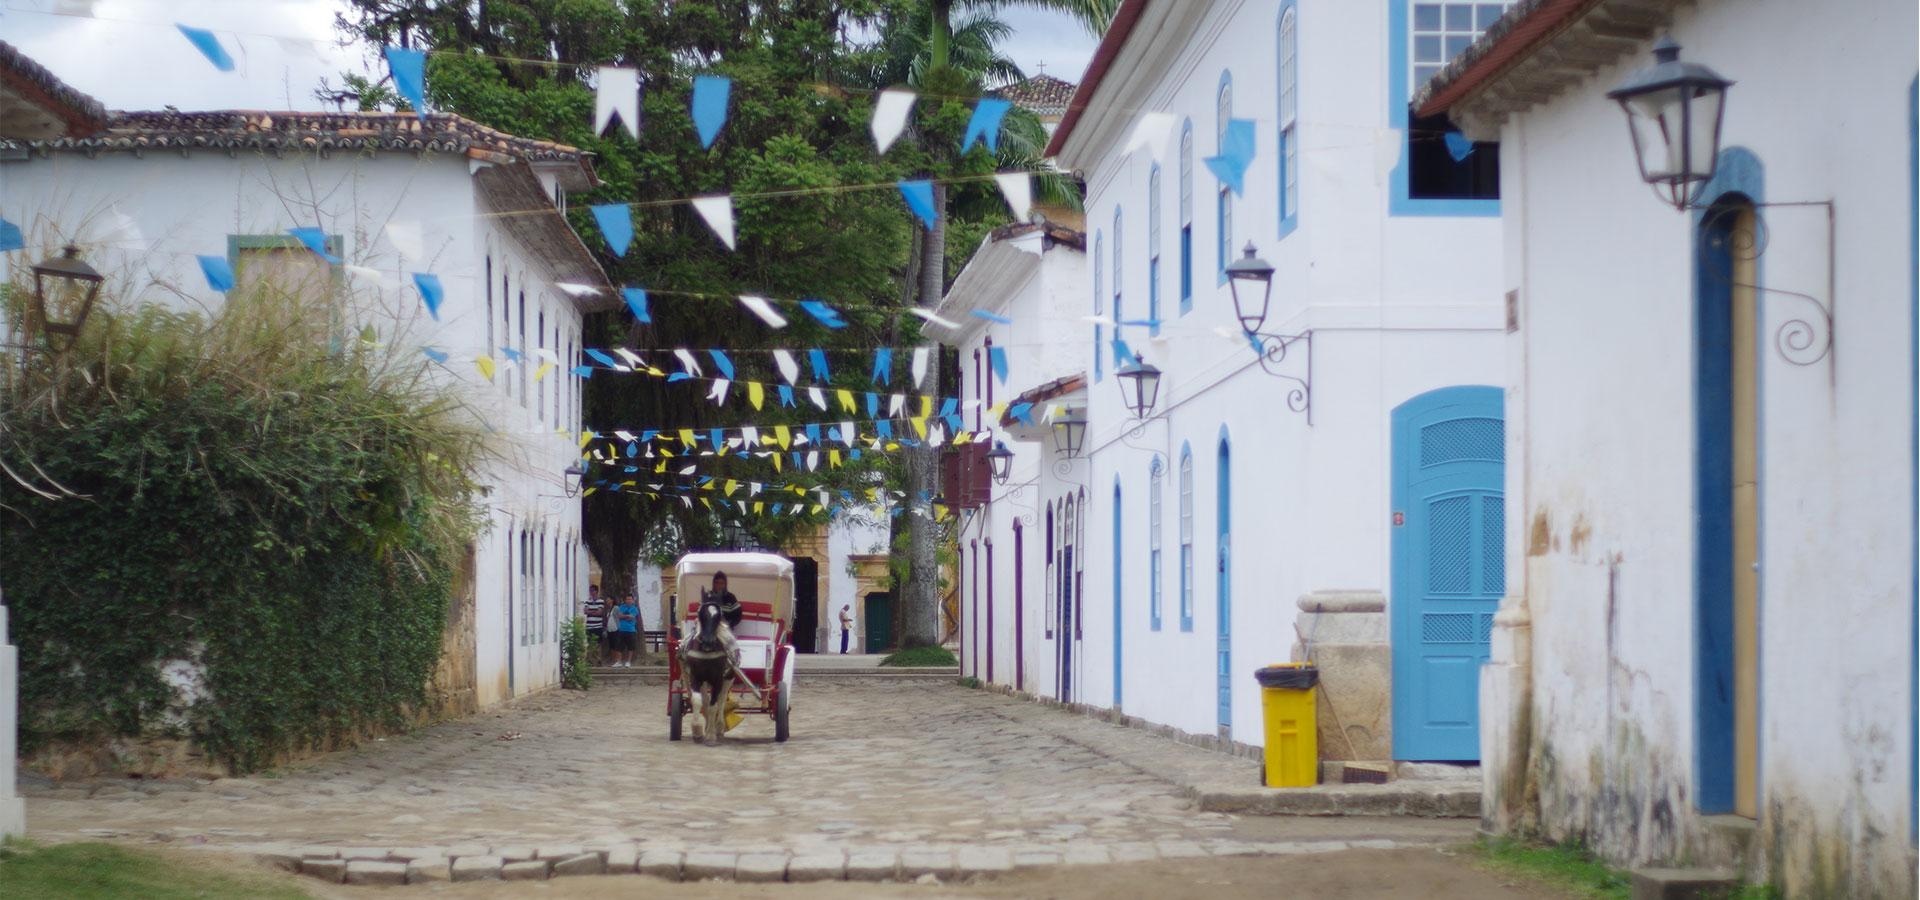 Kolonialstadt Paraty Gasse Südamerika